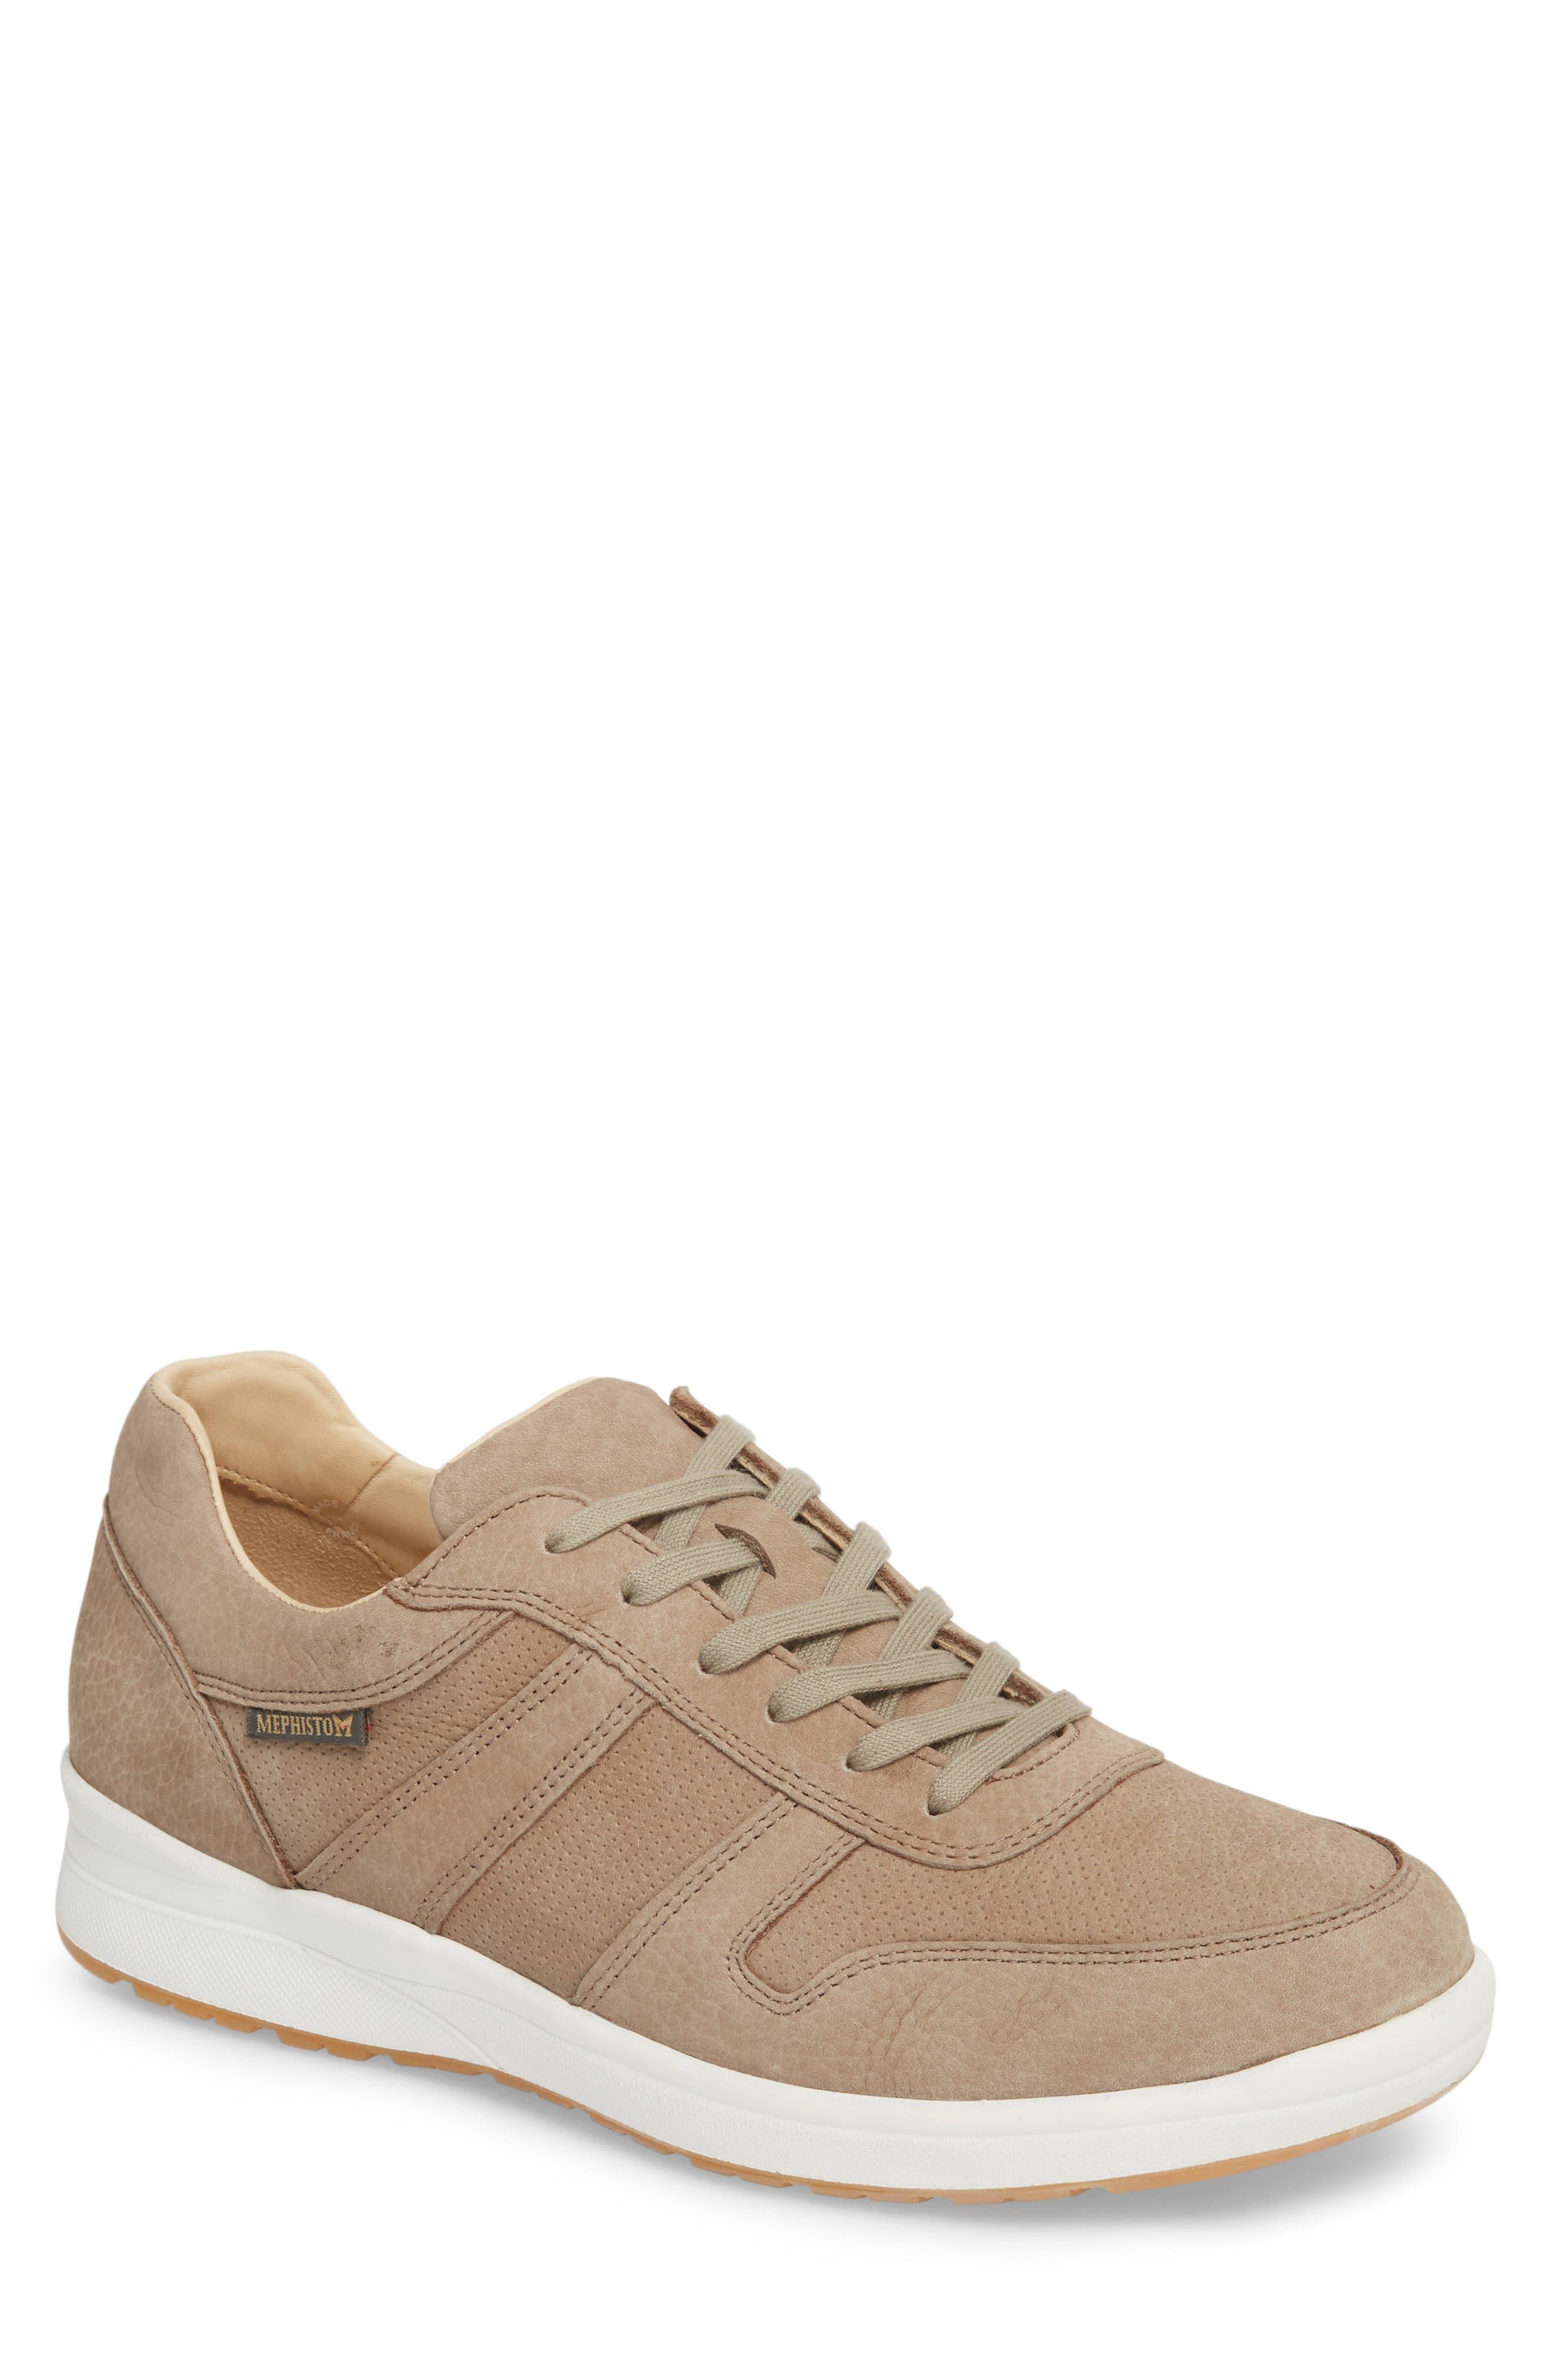 Vito Perforated Sneaker,                             Main thumbnail 1, color,                             281